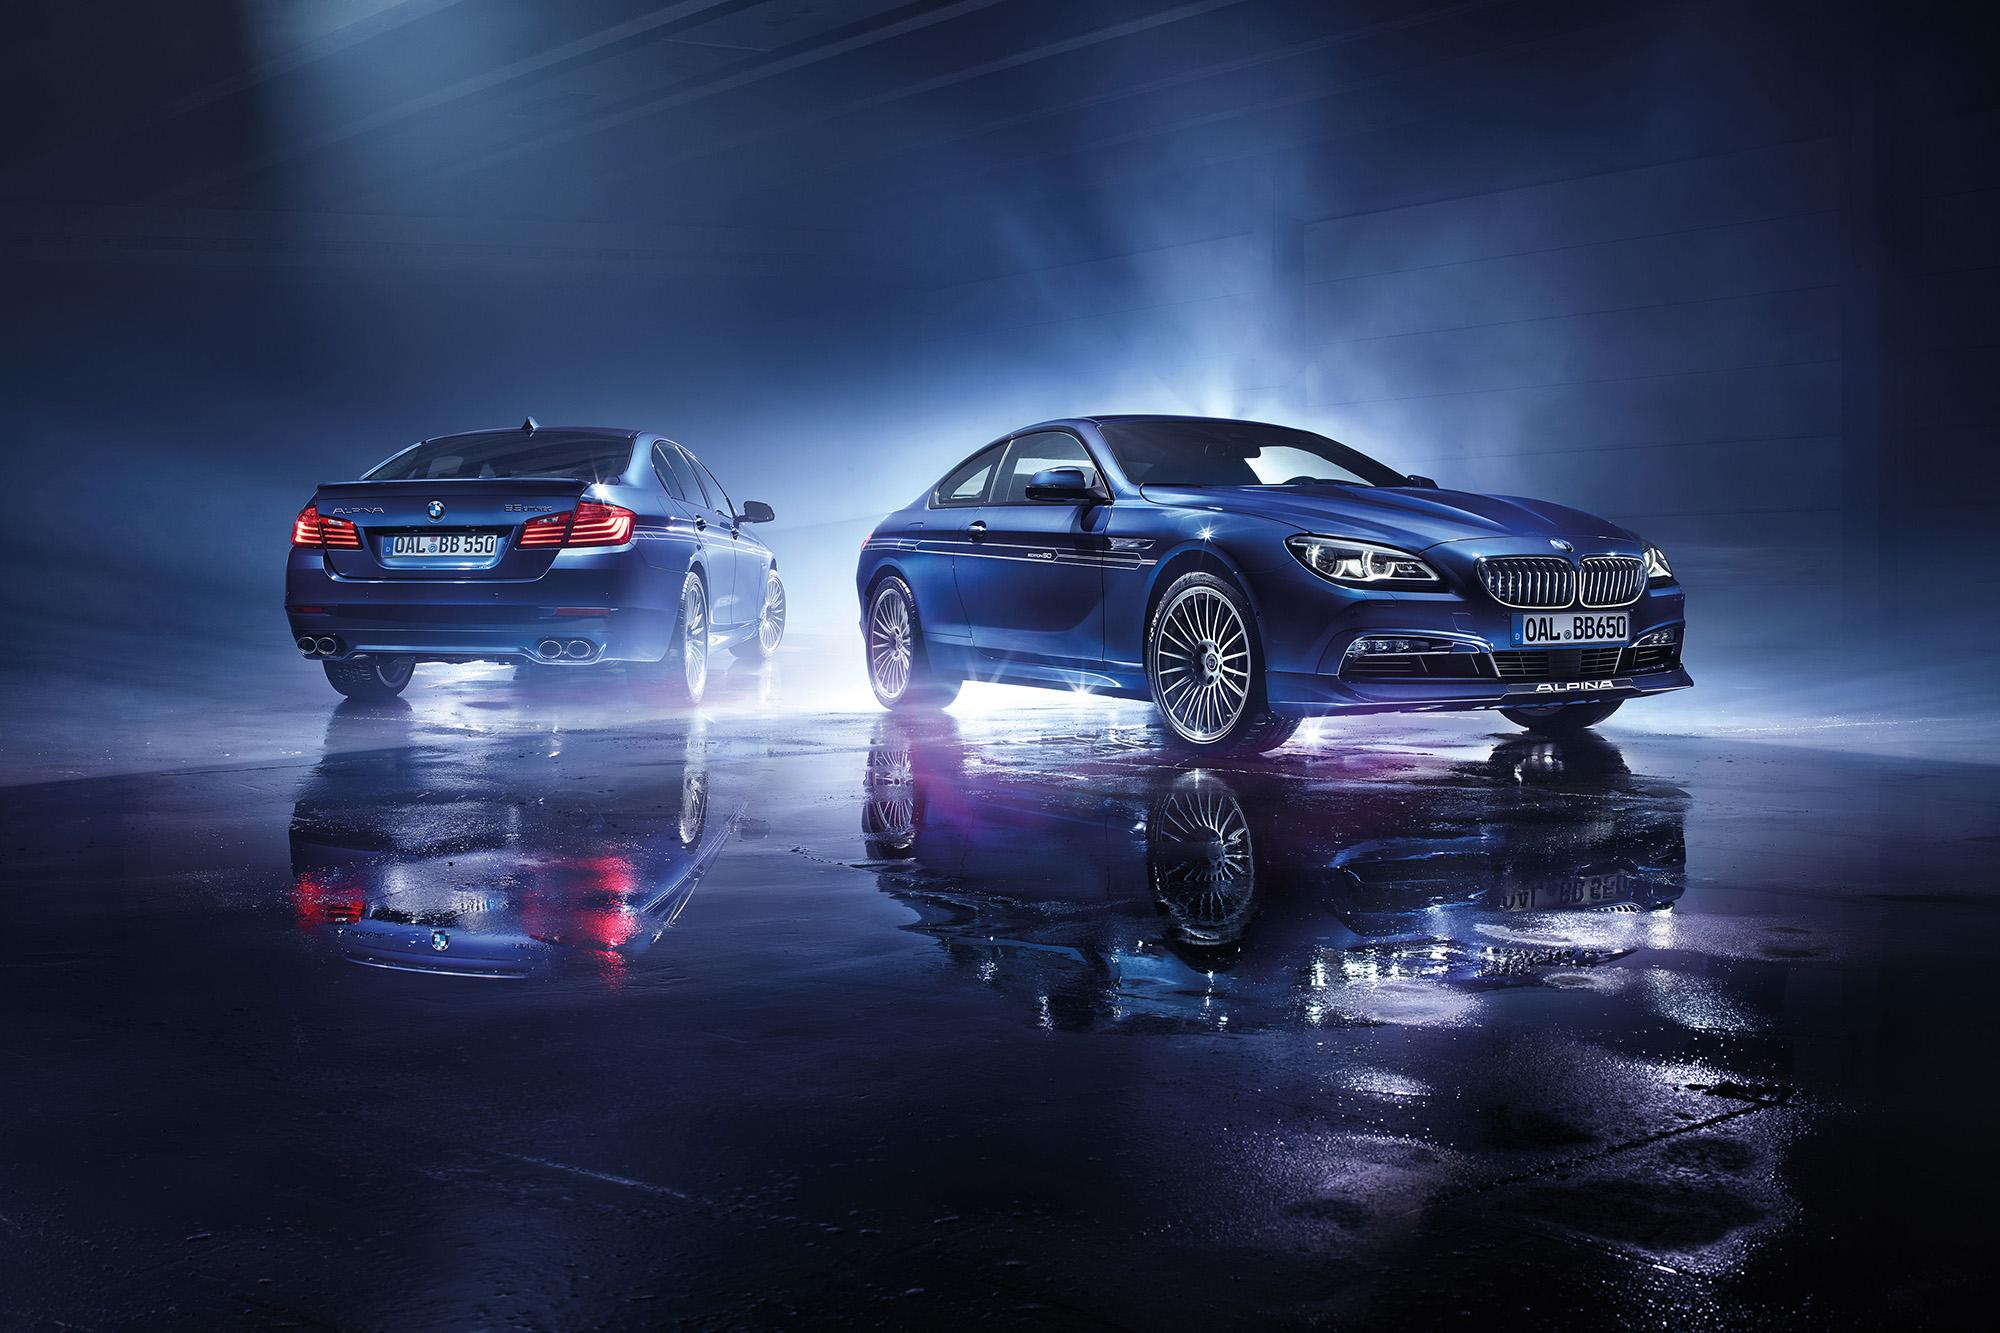 Alpina Drops New Super Sedan To Celebrate 50 Years